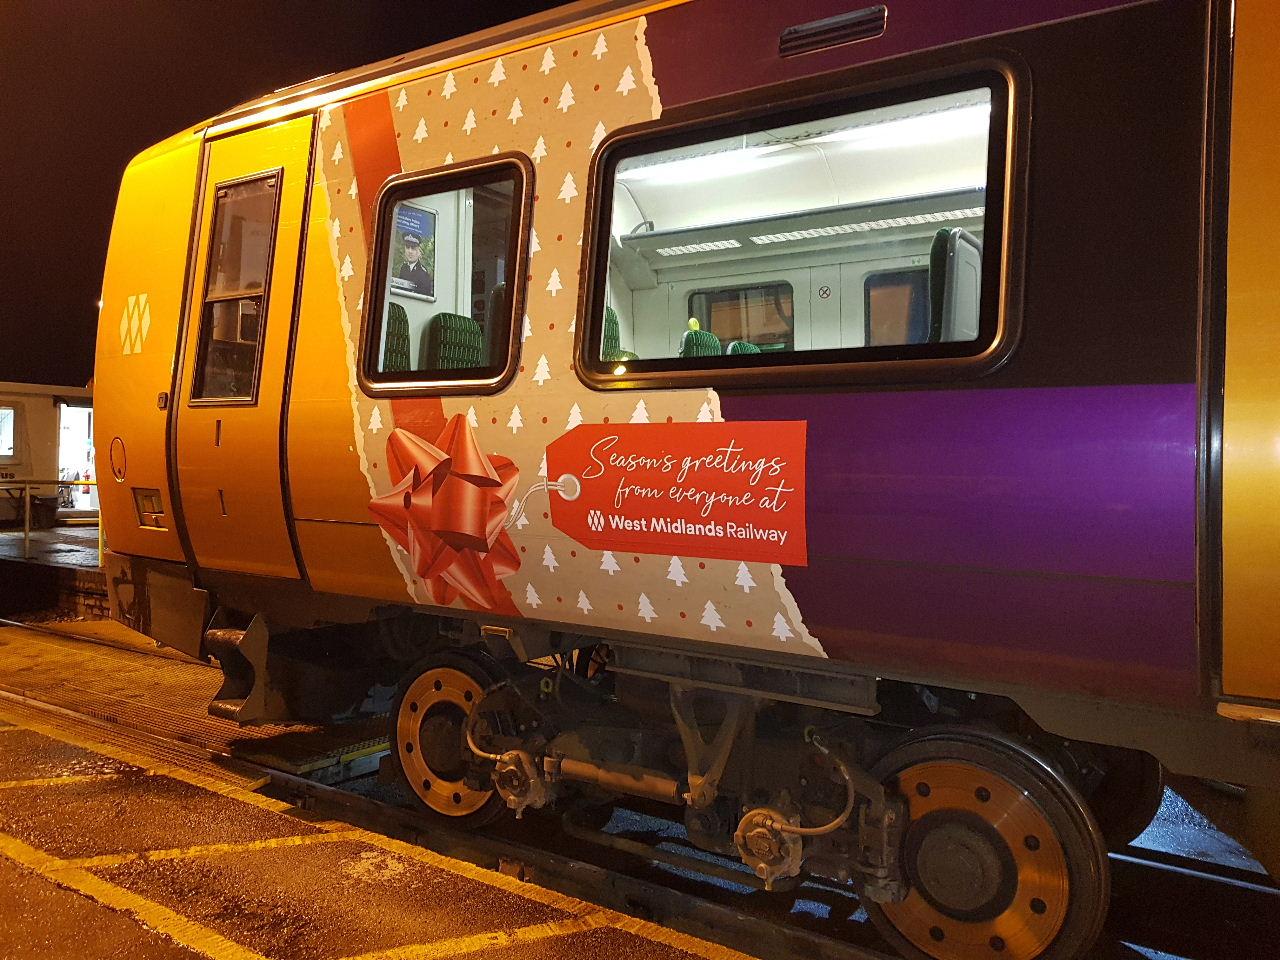 WMR train dsiplaying Christmas Greetings